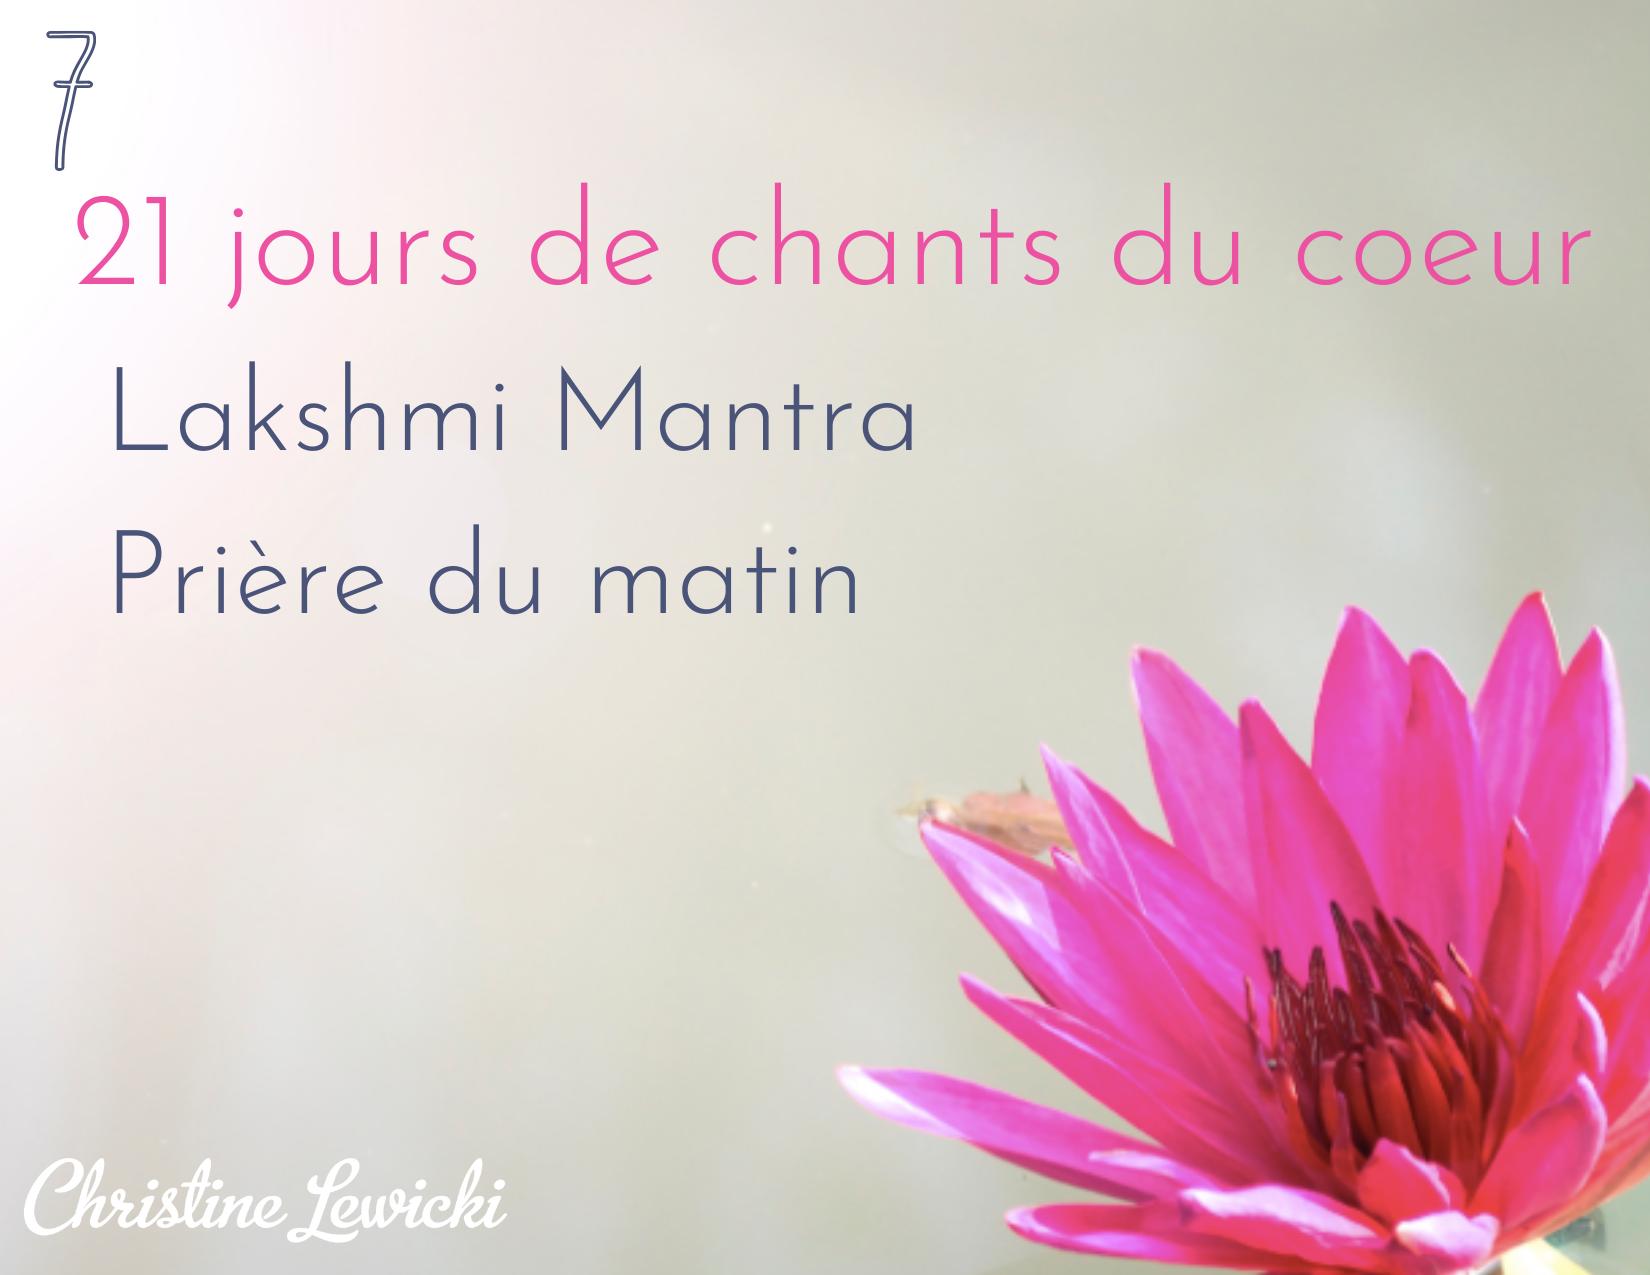 Lakshmi Mantra - prière du matin